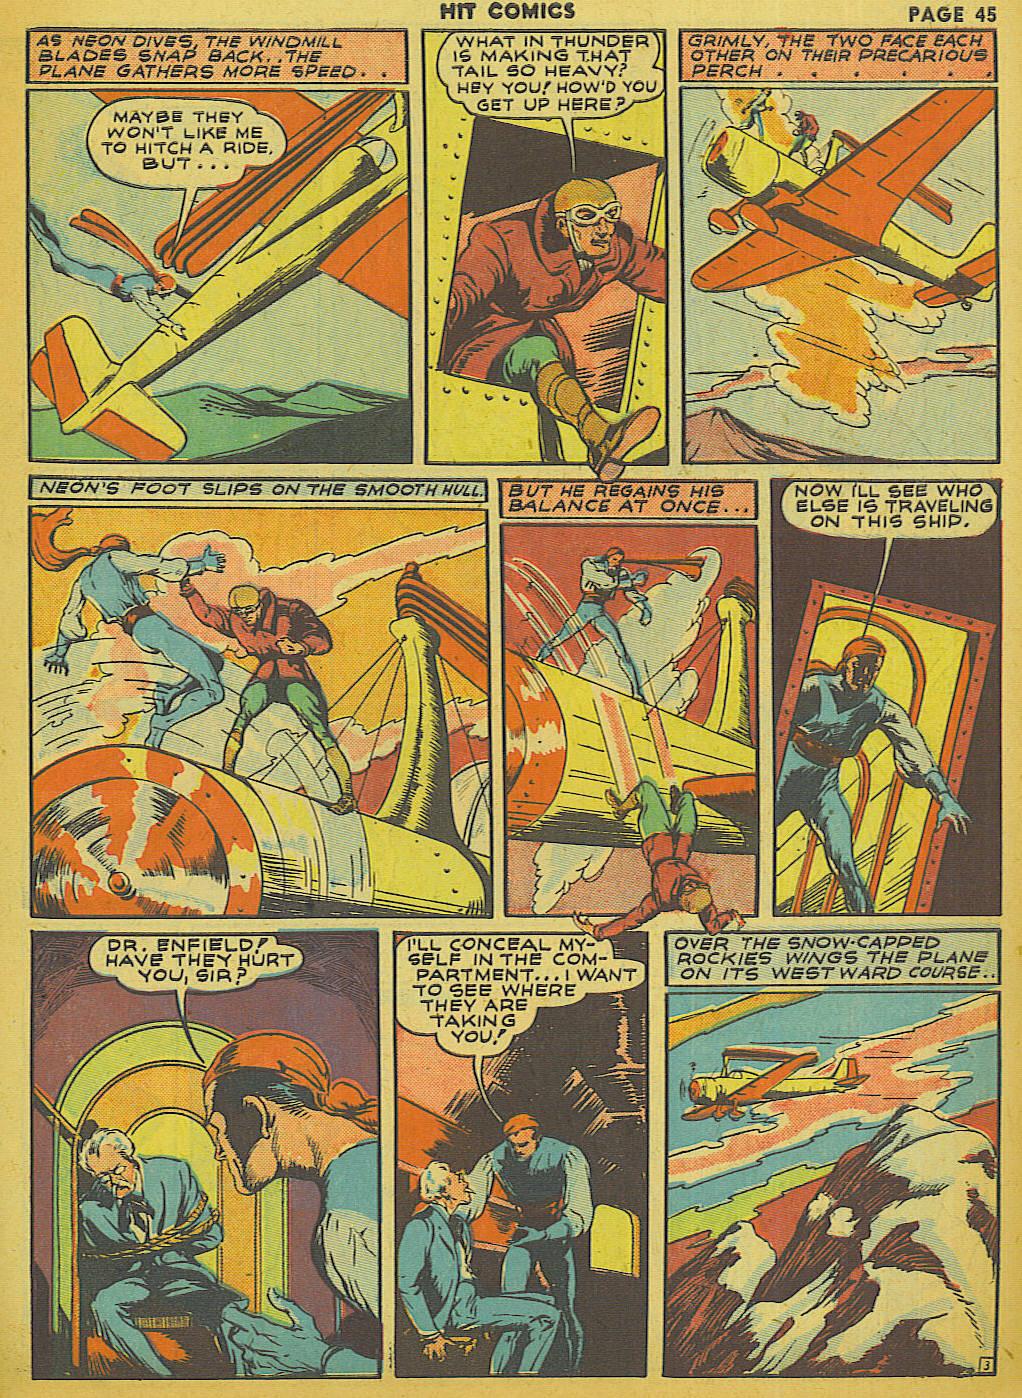 Read online Hit Comics comic -  Issue #13 - 47